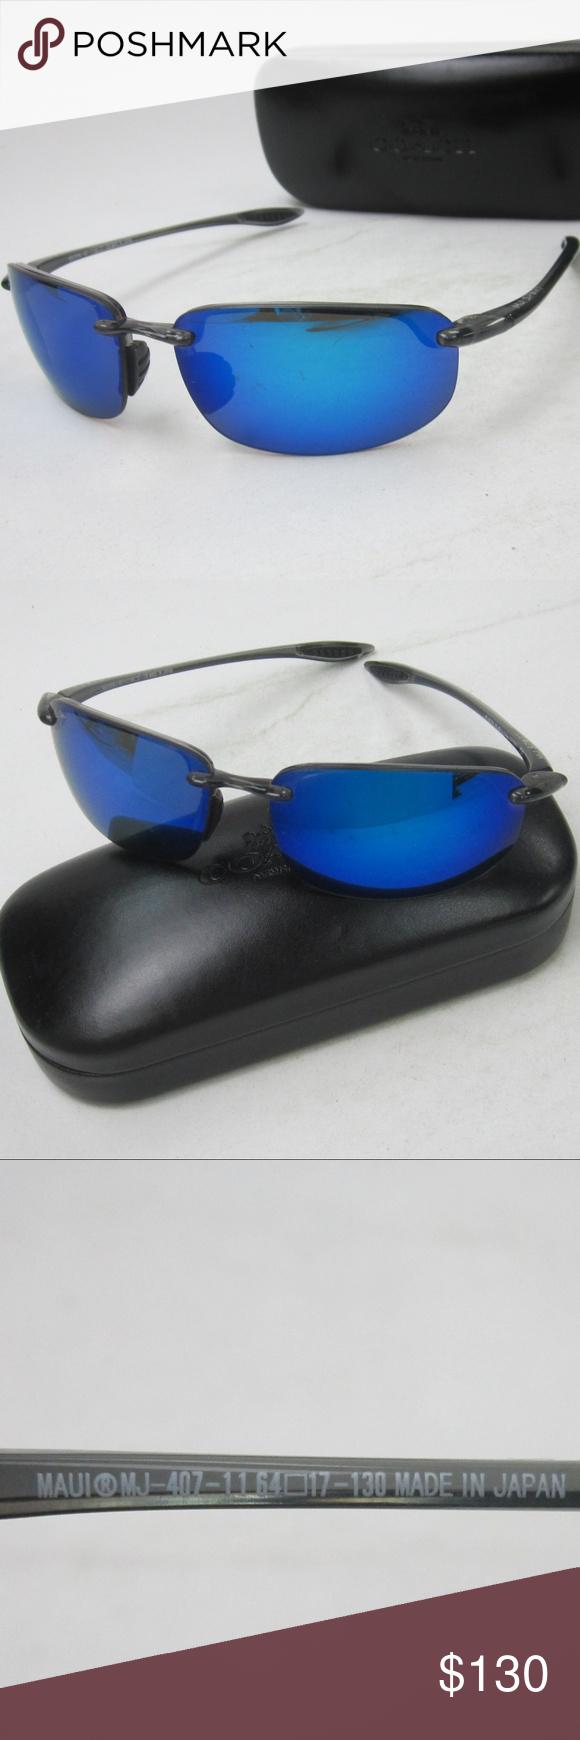 af43d12c180 Maui Jim MJ407-11 HO OKIPA Sunglasses Japan OLI211 Maui Jim MJ B407 ...